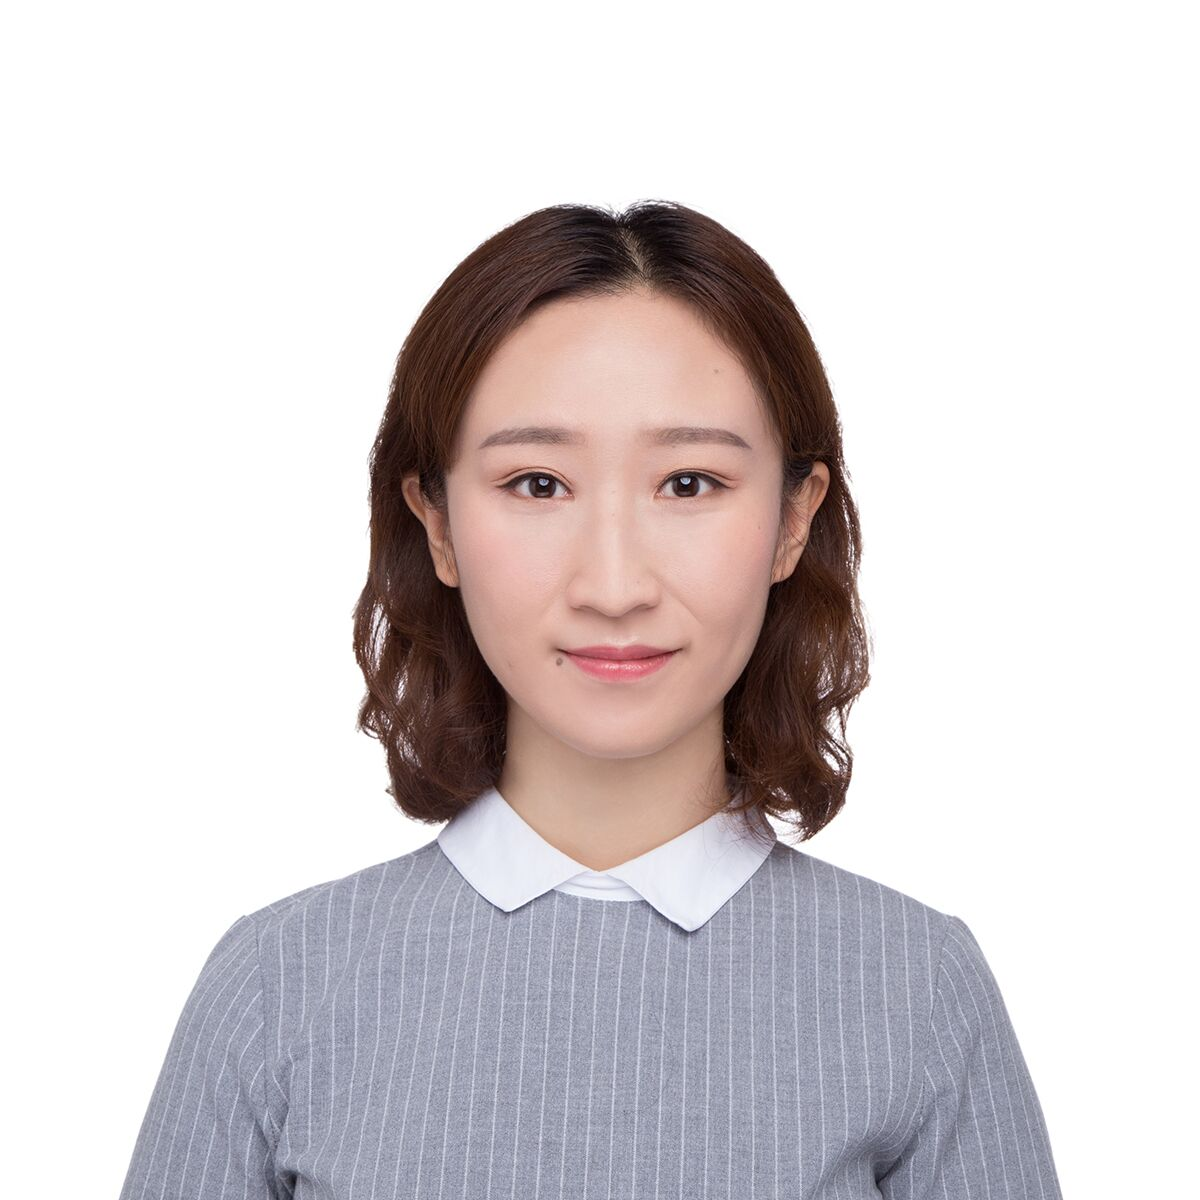 Yi Han - MD PhD student